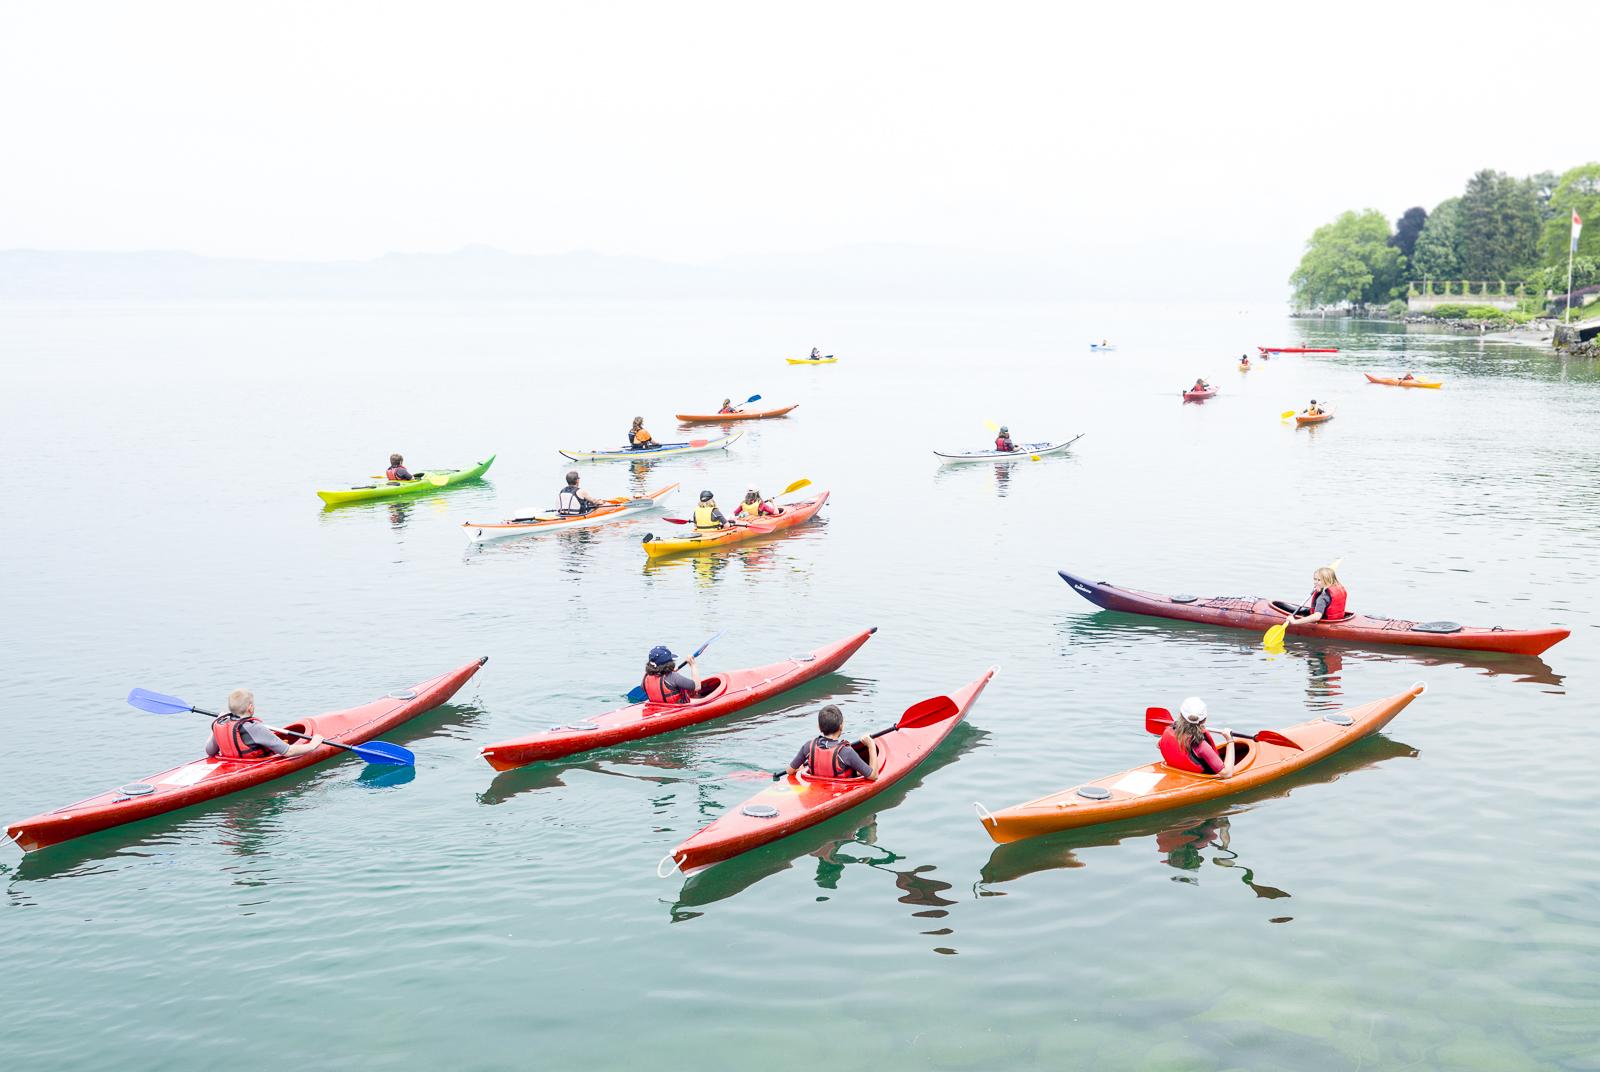 Leman Lake, Evian, France